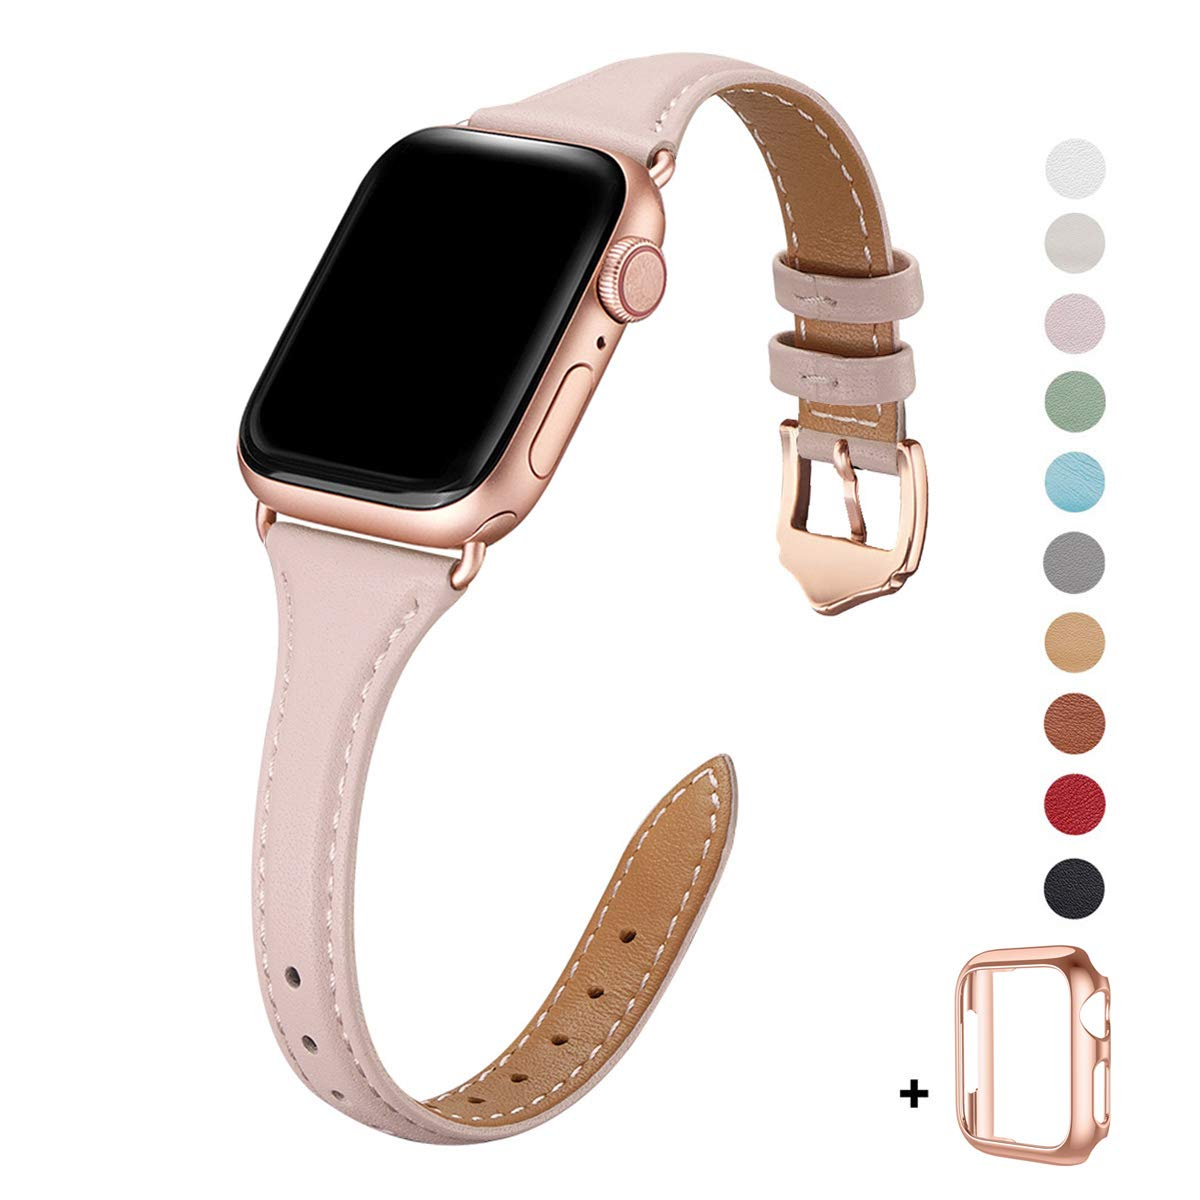 Malla Cuero para Apple Watch (42/44mm) WFEAGL [7W88DX28]